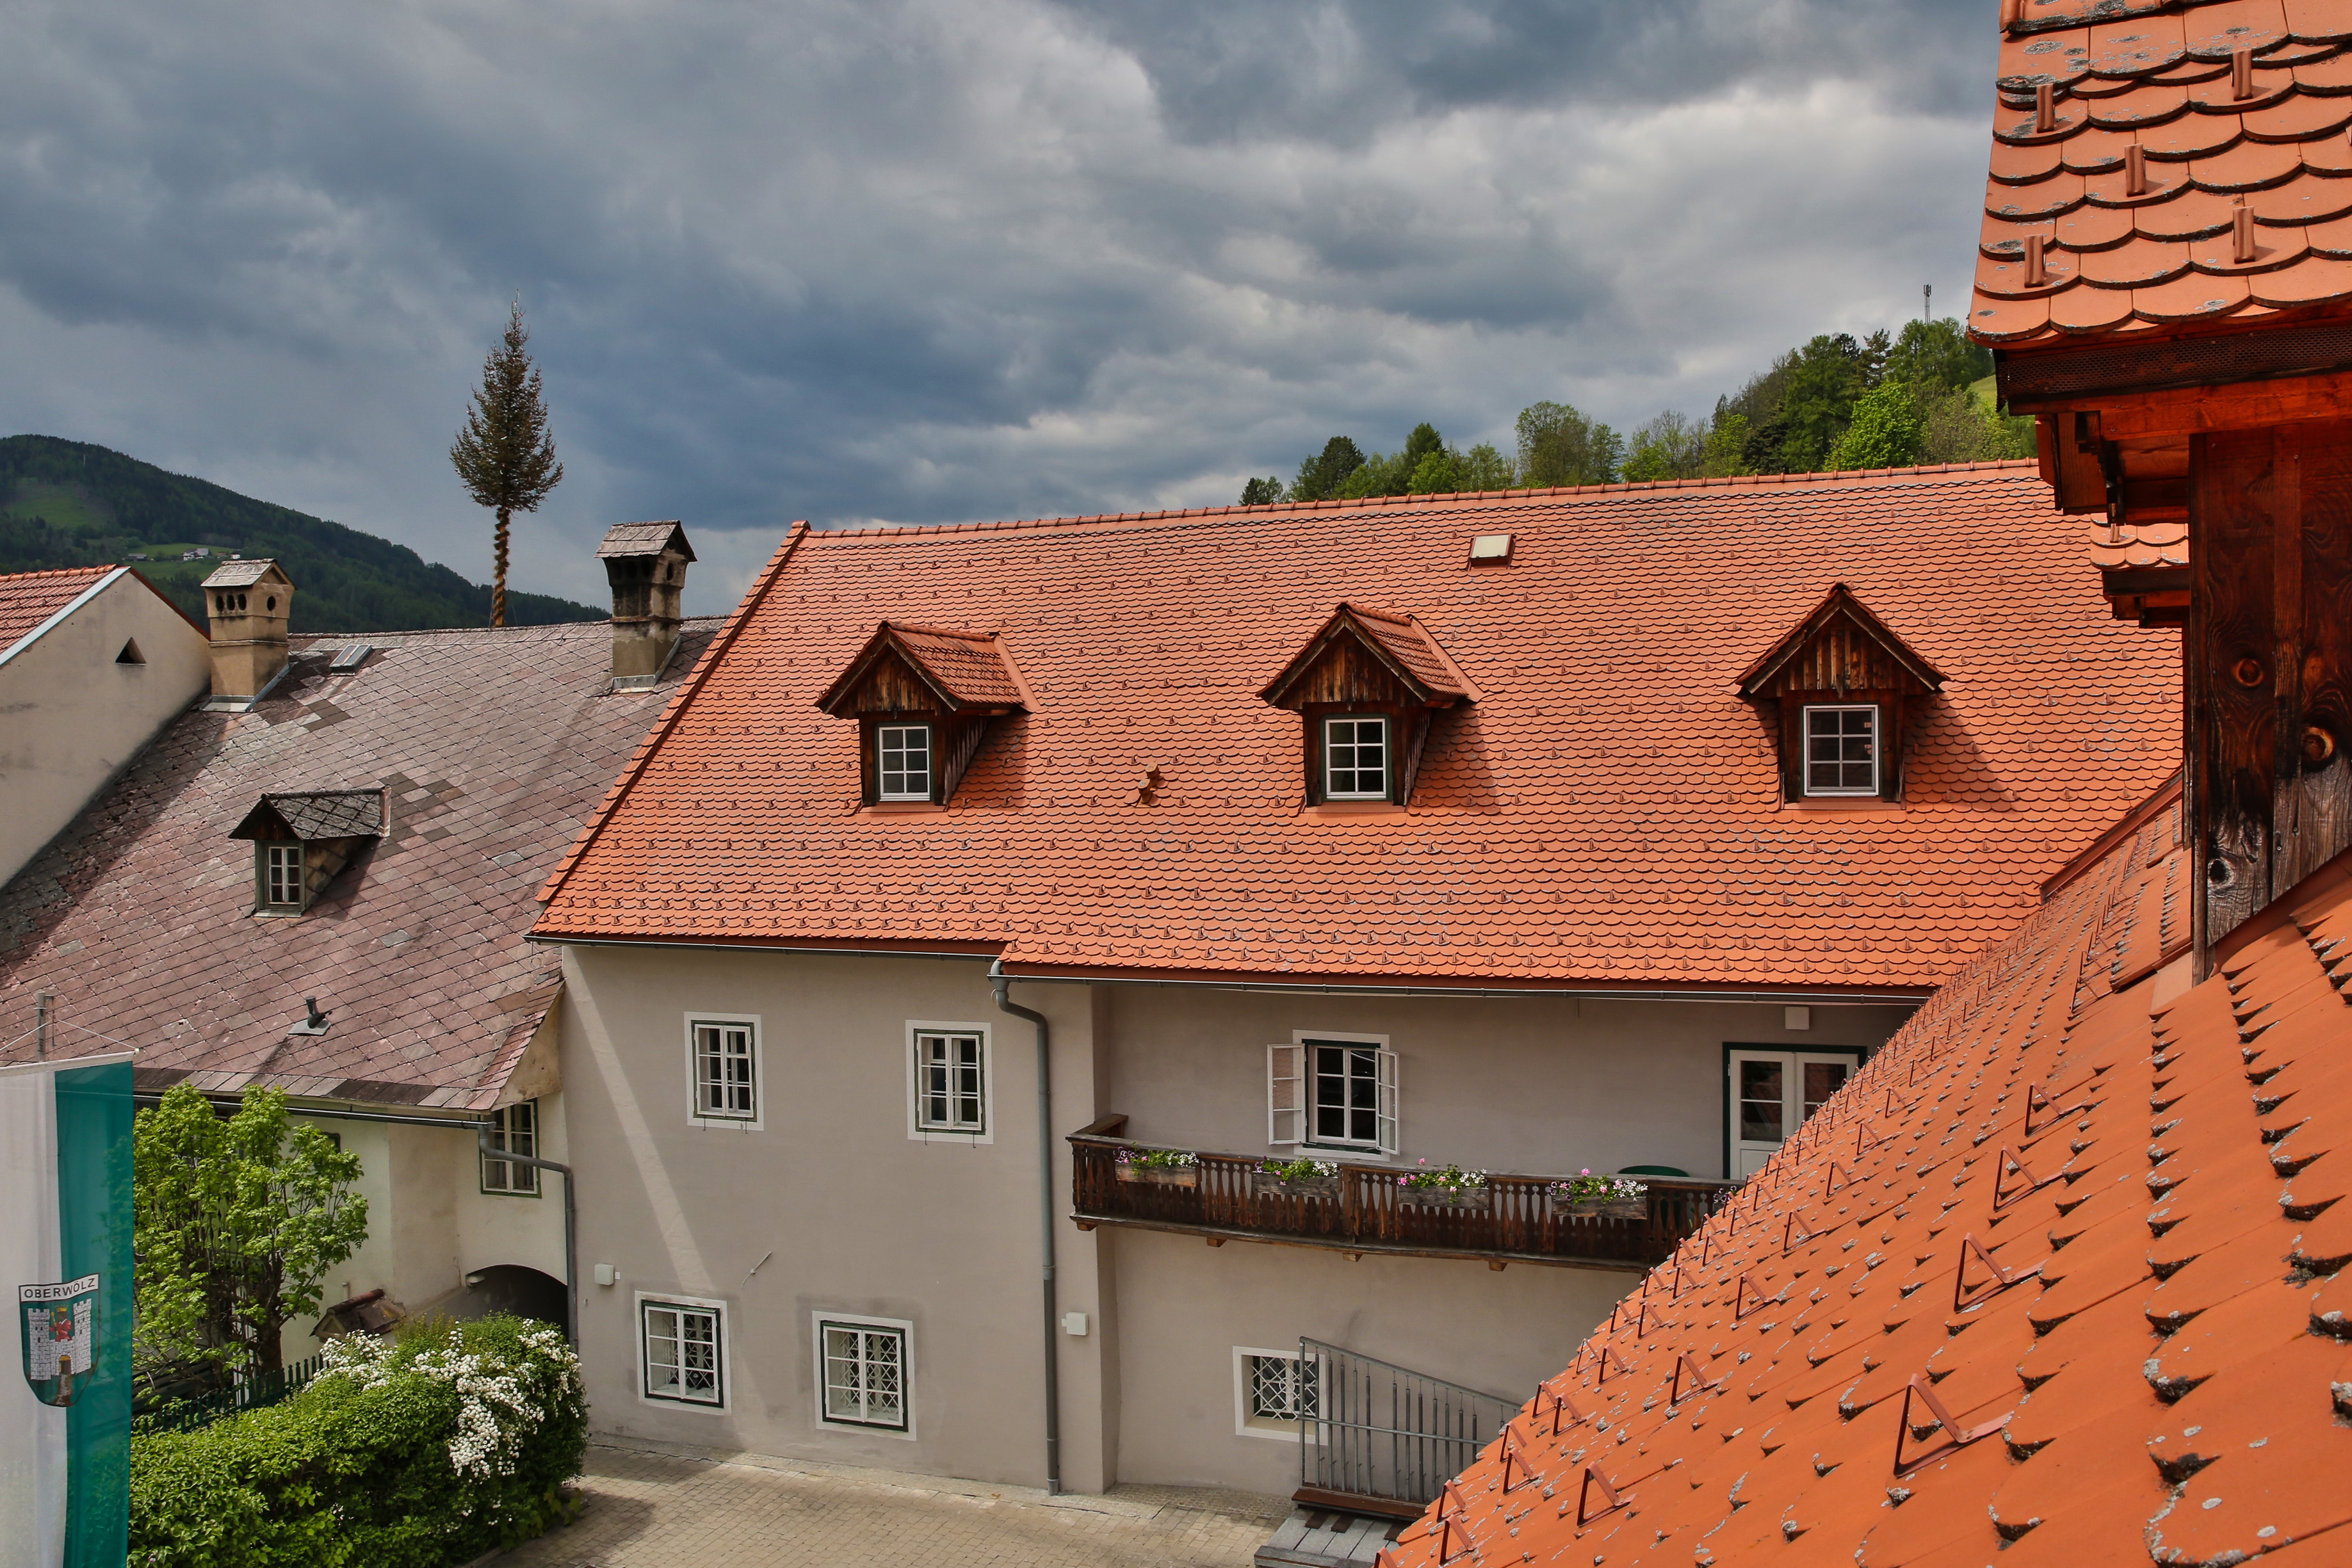 Innsbruck Dating Site, Sexinserate Oberwlz